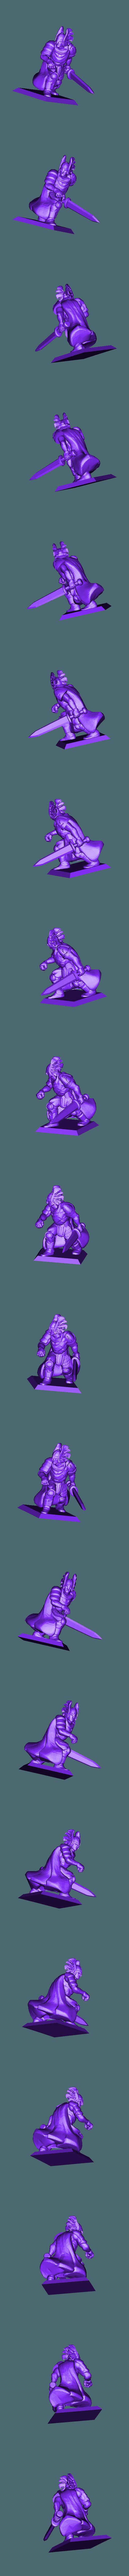 paladin_defensive.stl Download free STL file Fantasy Mini Collection (multiple poses) • 3D printable object, stockto